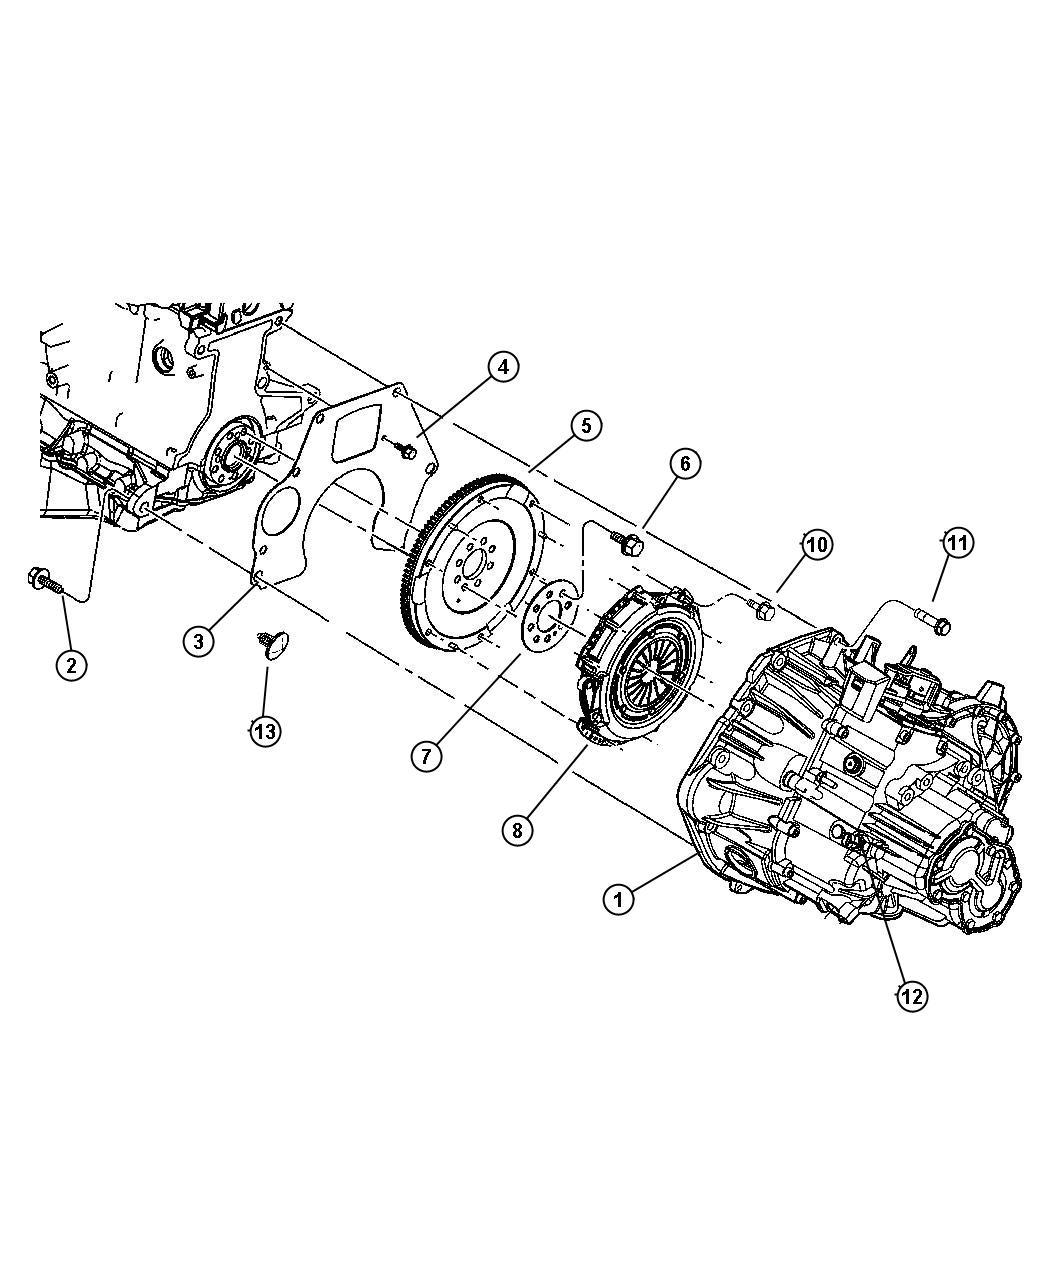 Chrysler Pt Cruiser Clutch Kit Manual Transmission